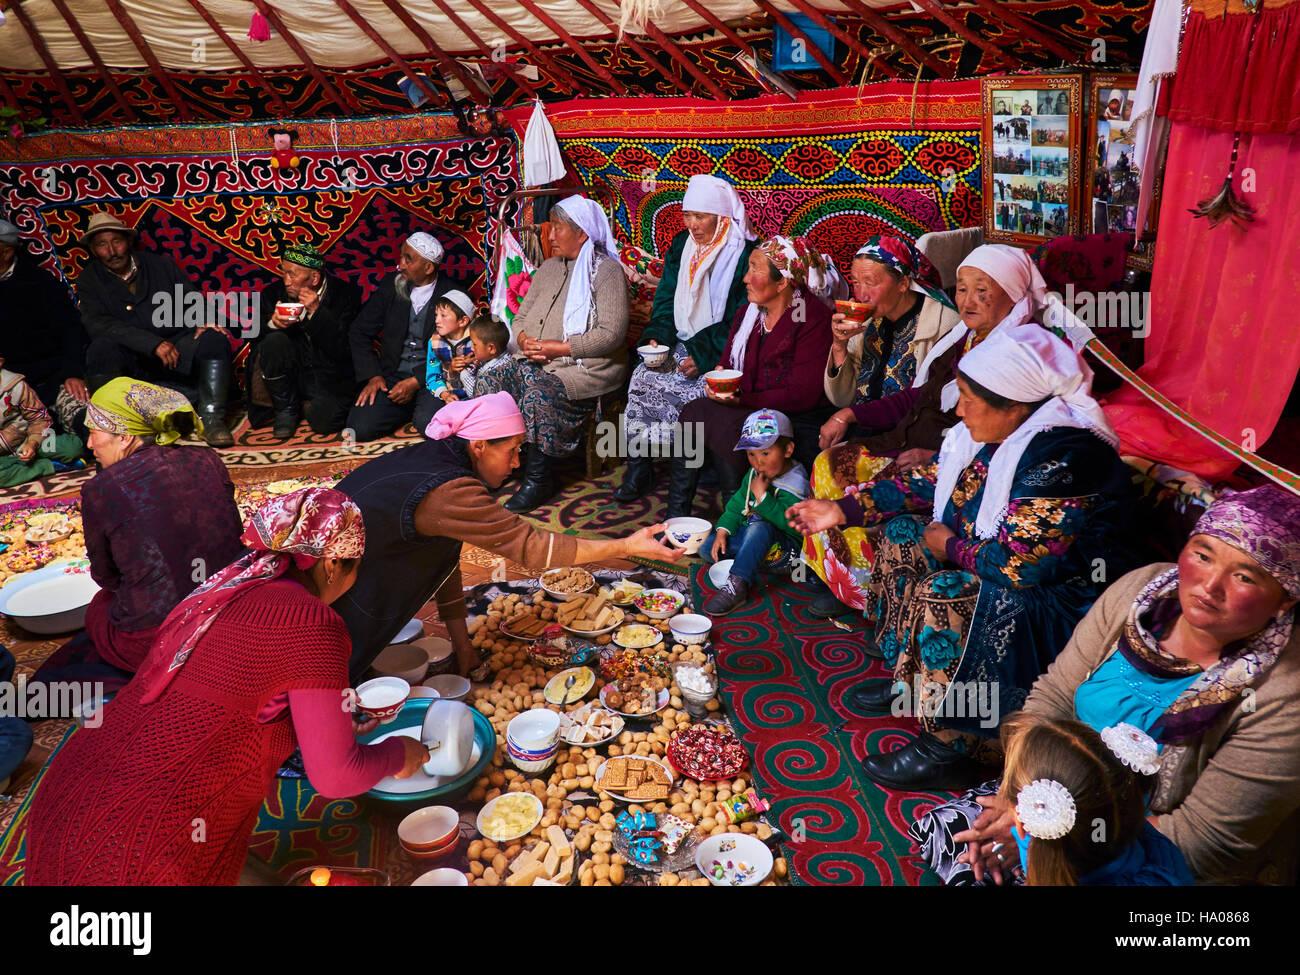 Mongolia, Bayan-Ulgii provincia, oeste de Mongolia, campamento nómada del pueblo kazajo en la estepa, festival Imagen De Stock